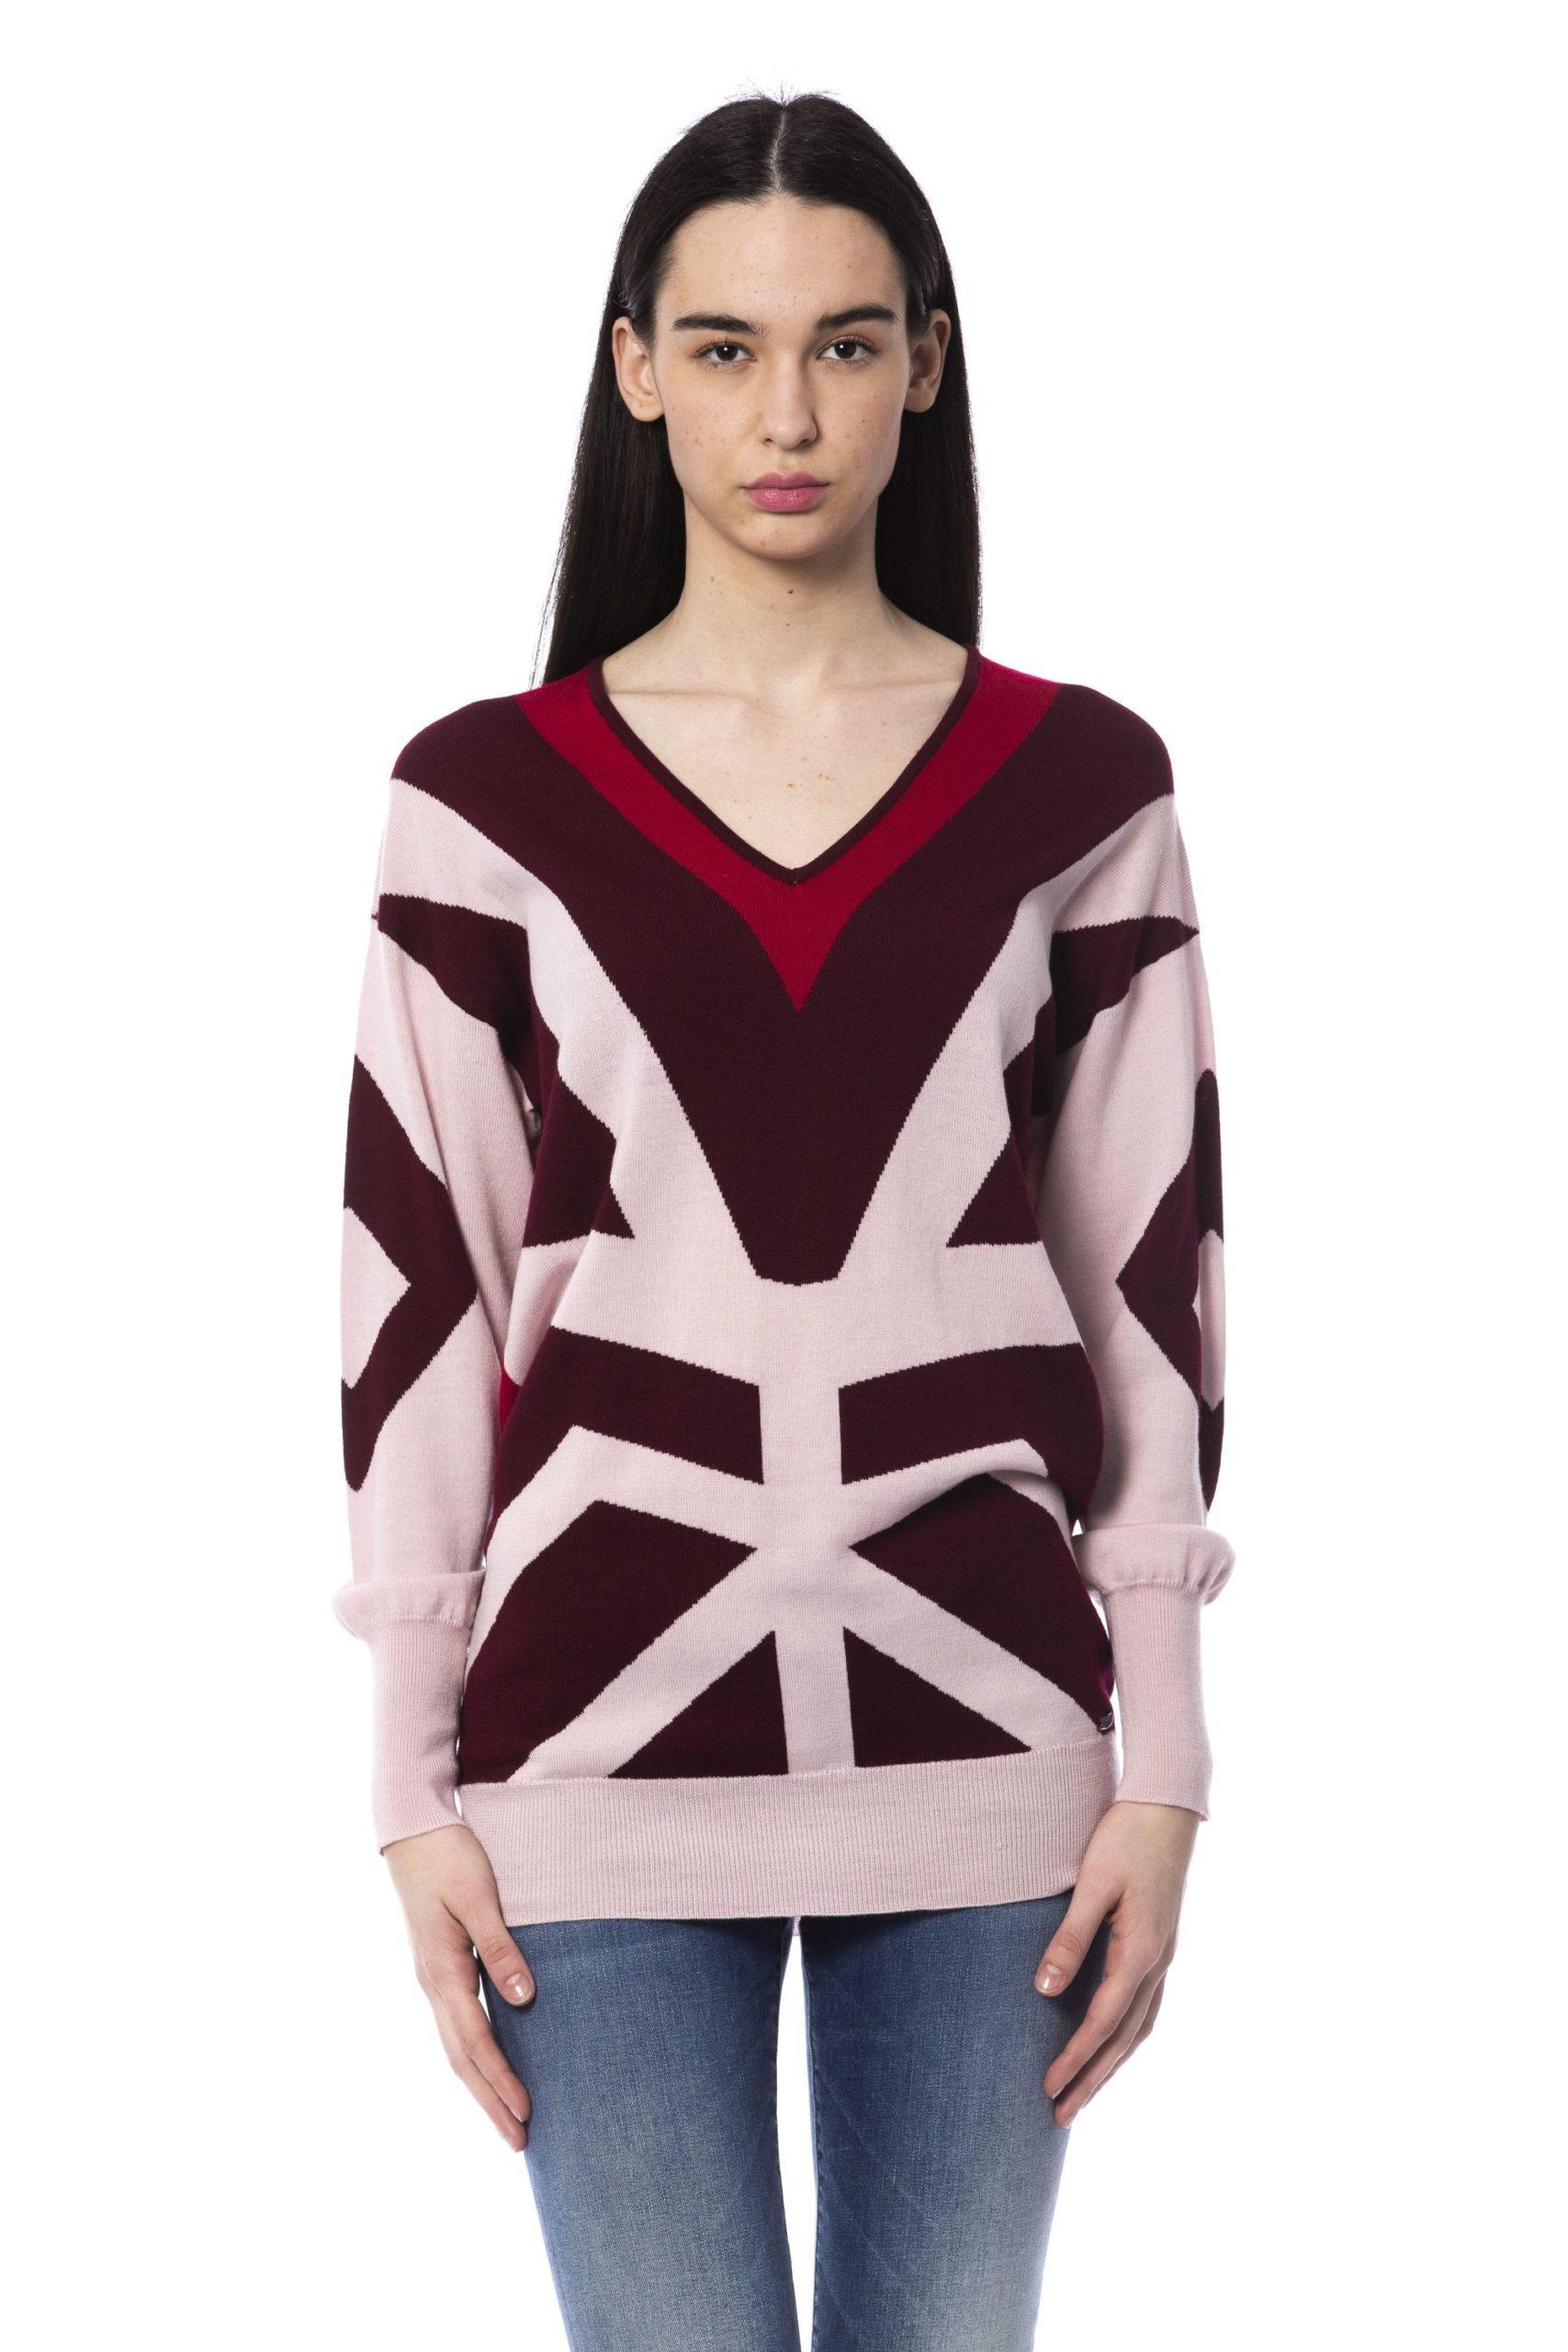 Byblos Women's Sweater Burgundy BY851754 - S